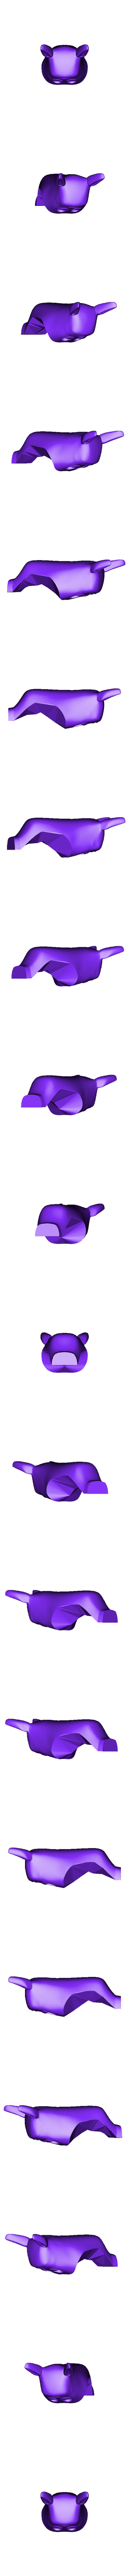 head_no_brace.stl Download free STL file Astro Jetson • 3D print model, reddadsteve